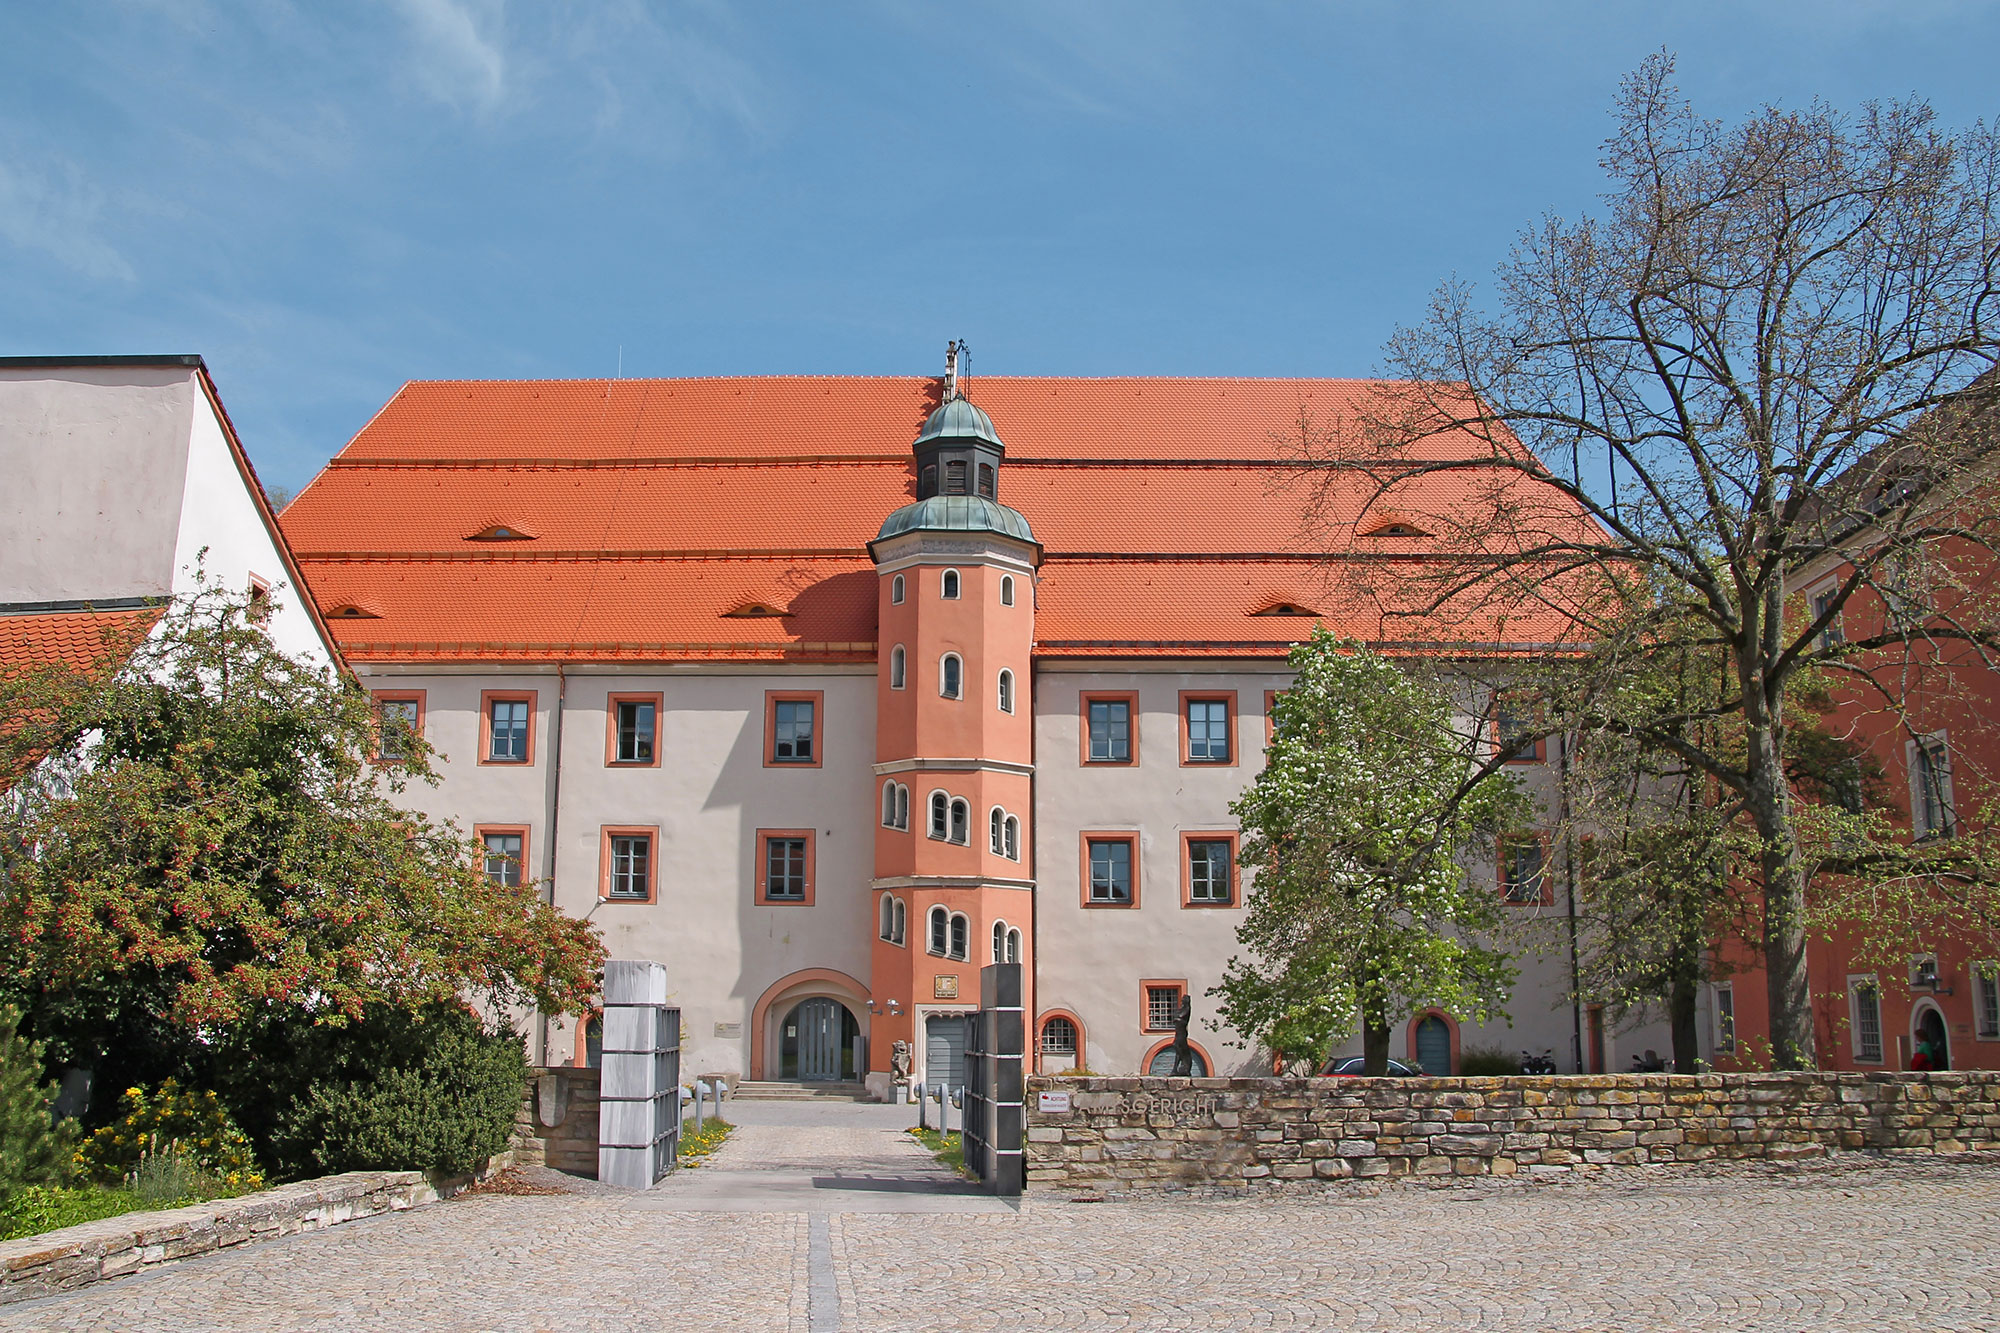 Das Pfalzgrafenschloss in Neumarkt.